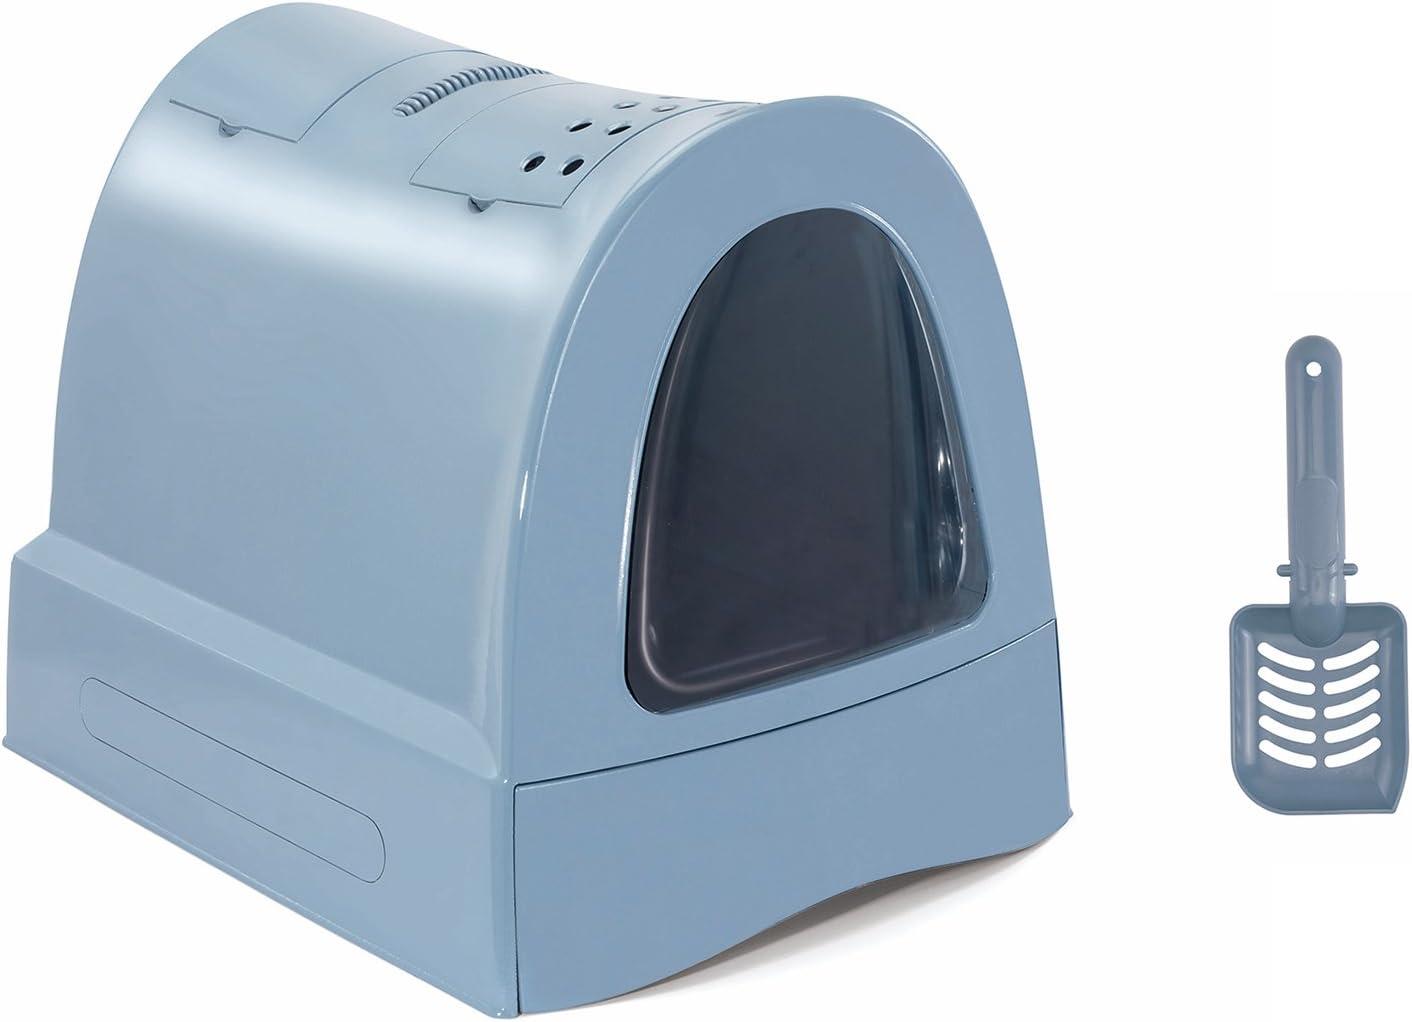 IMAC WC Gatos ZUMA, 40x42.5x56cm, Azul, Gato